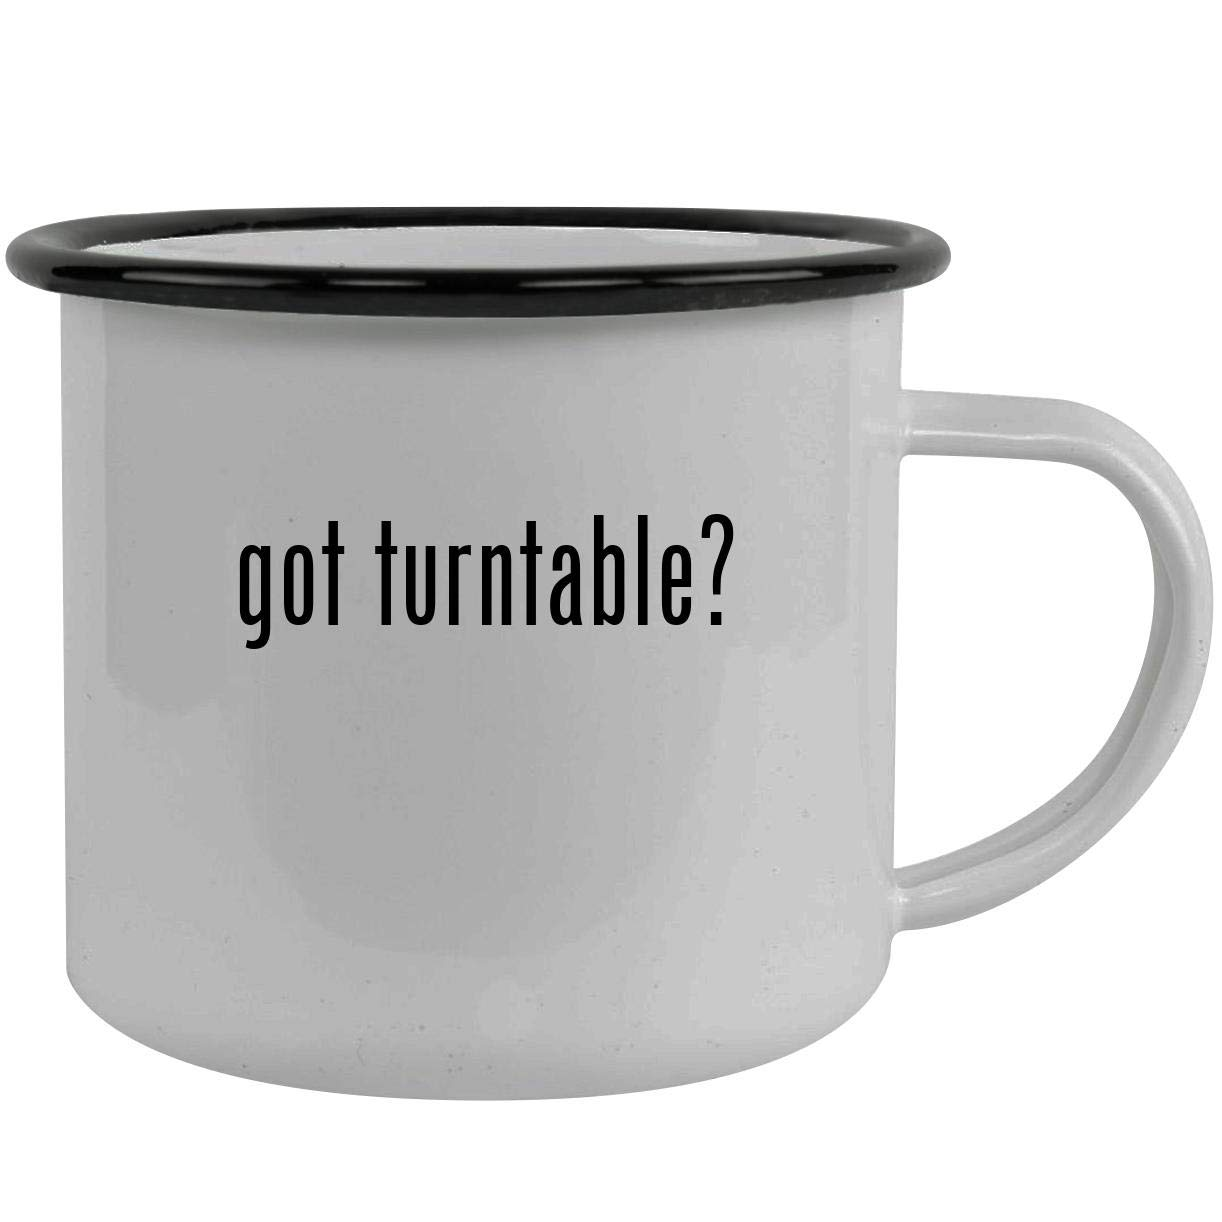 got turntable? - Stainless Steel 12oz Camping Mug, Black